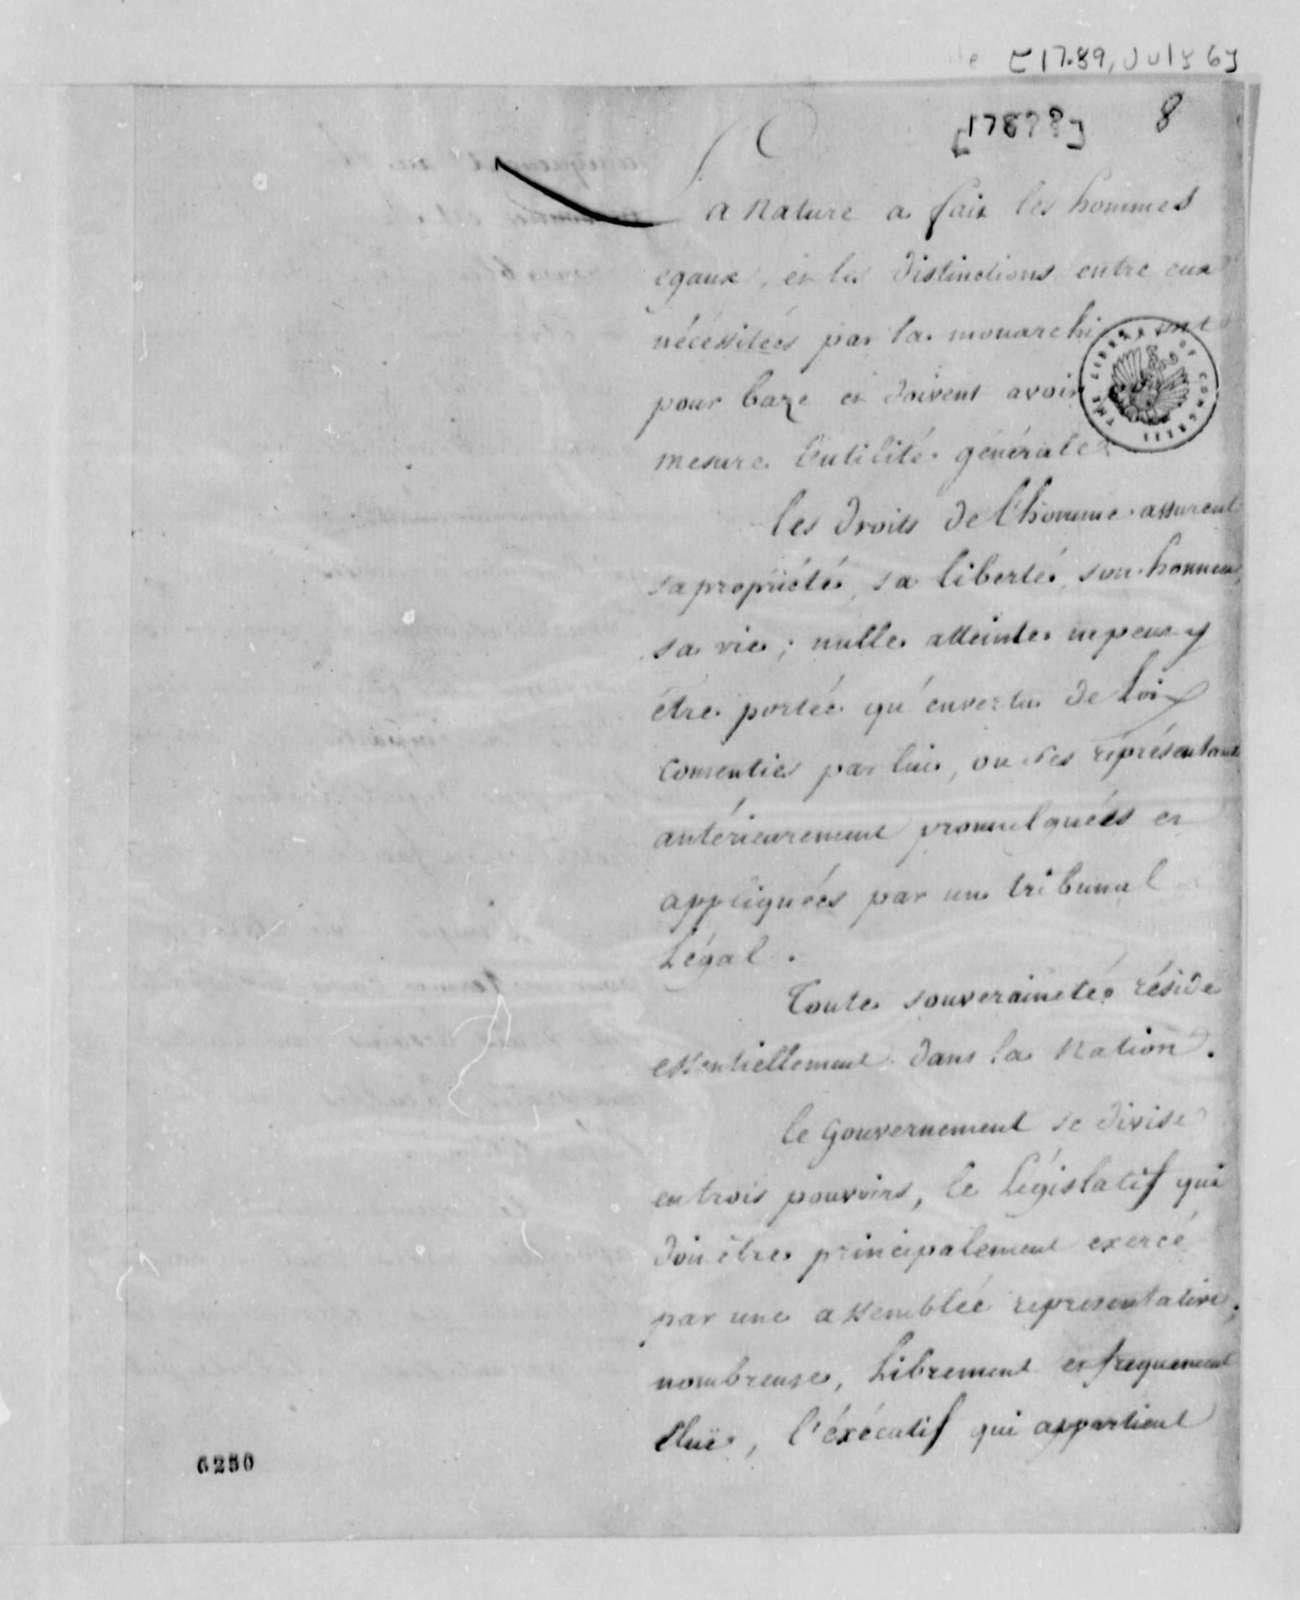 Marie Joseph Paul Yves Roch Gilbert du Motier, Marquis de Lafayette, July 6, 1789, Declaration of Rights, with Draft